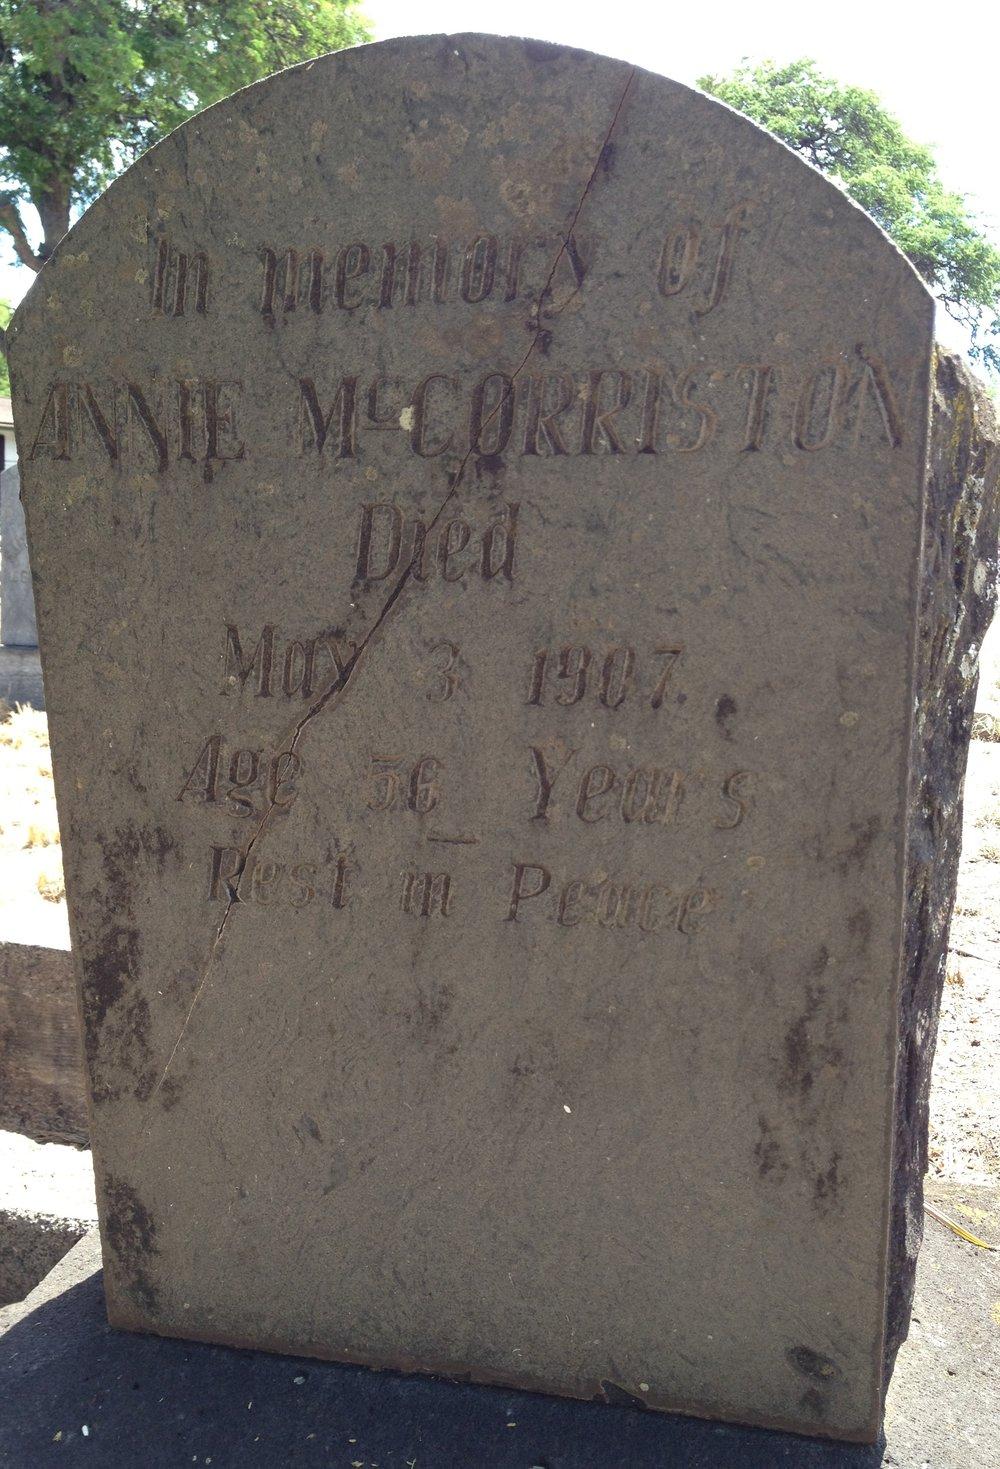 Annie Nelson McCorriston's Headstone, Kamalo